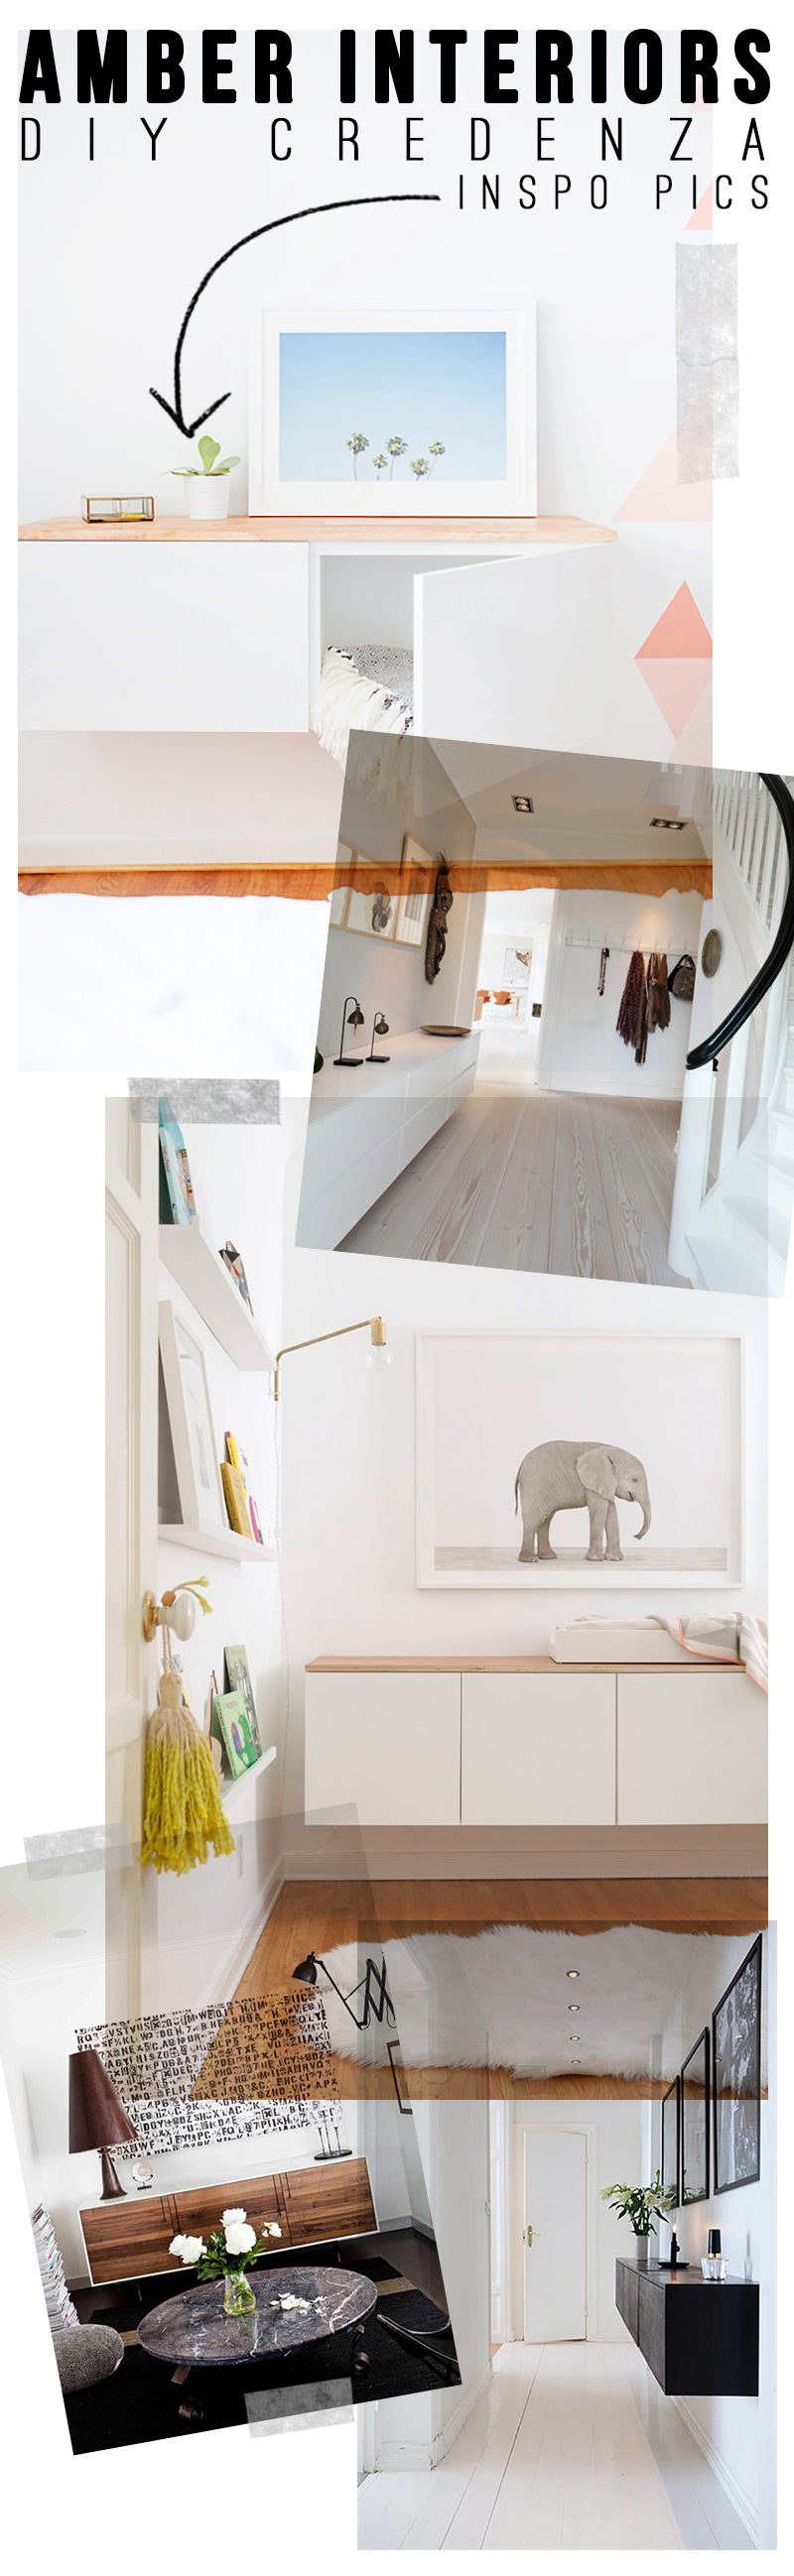 Amber Interiors - DIY - Credenza